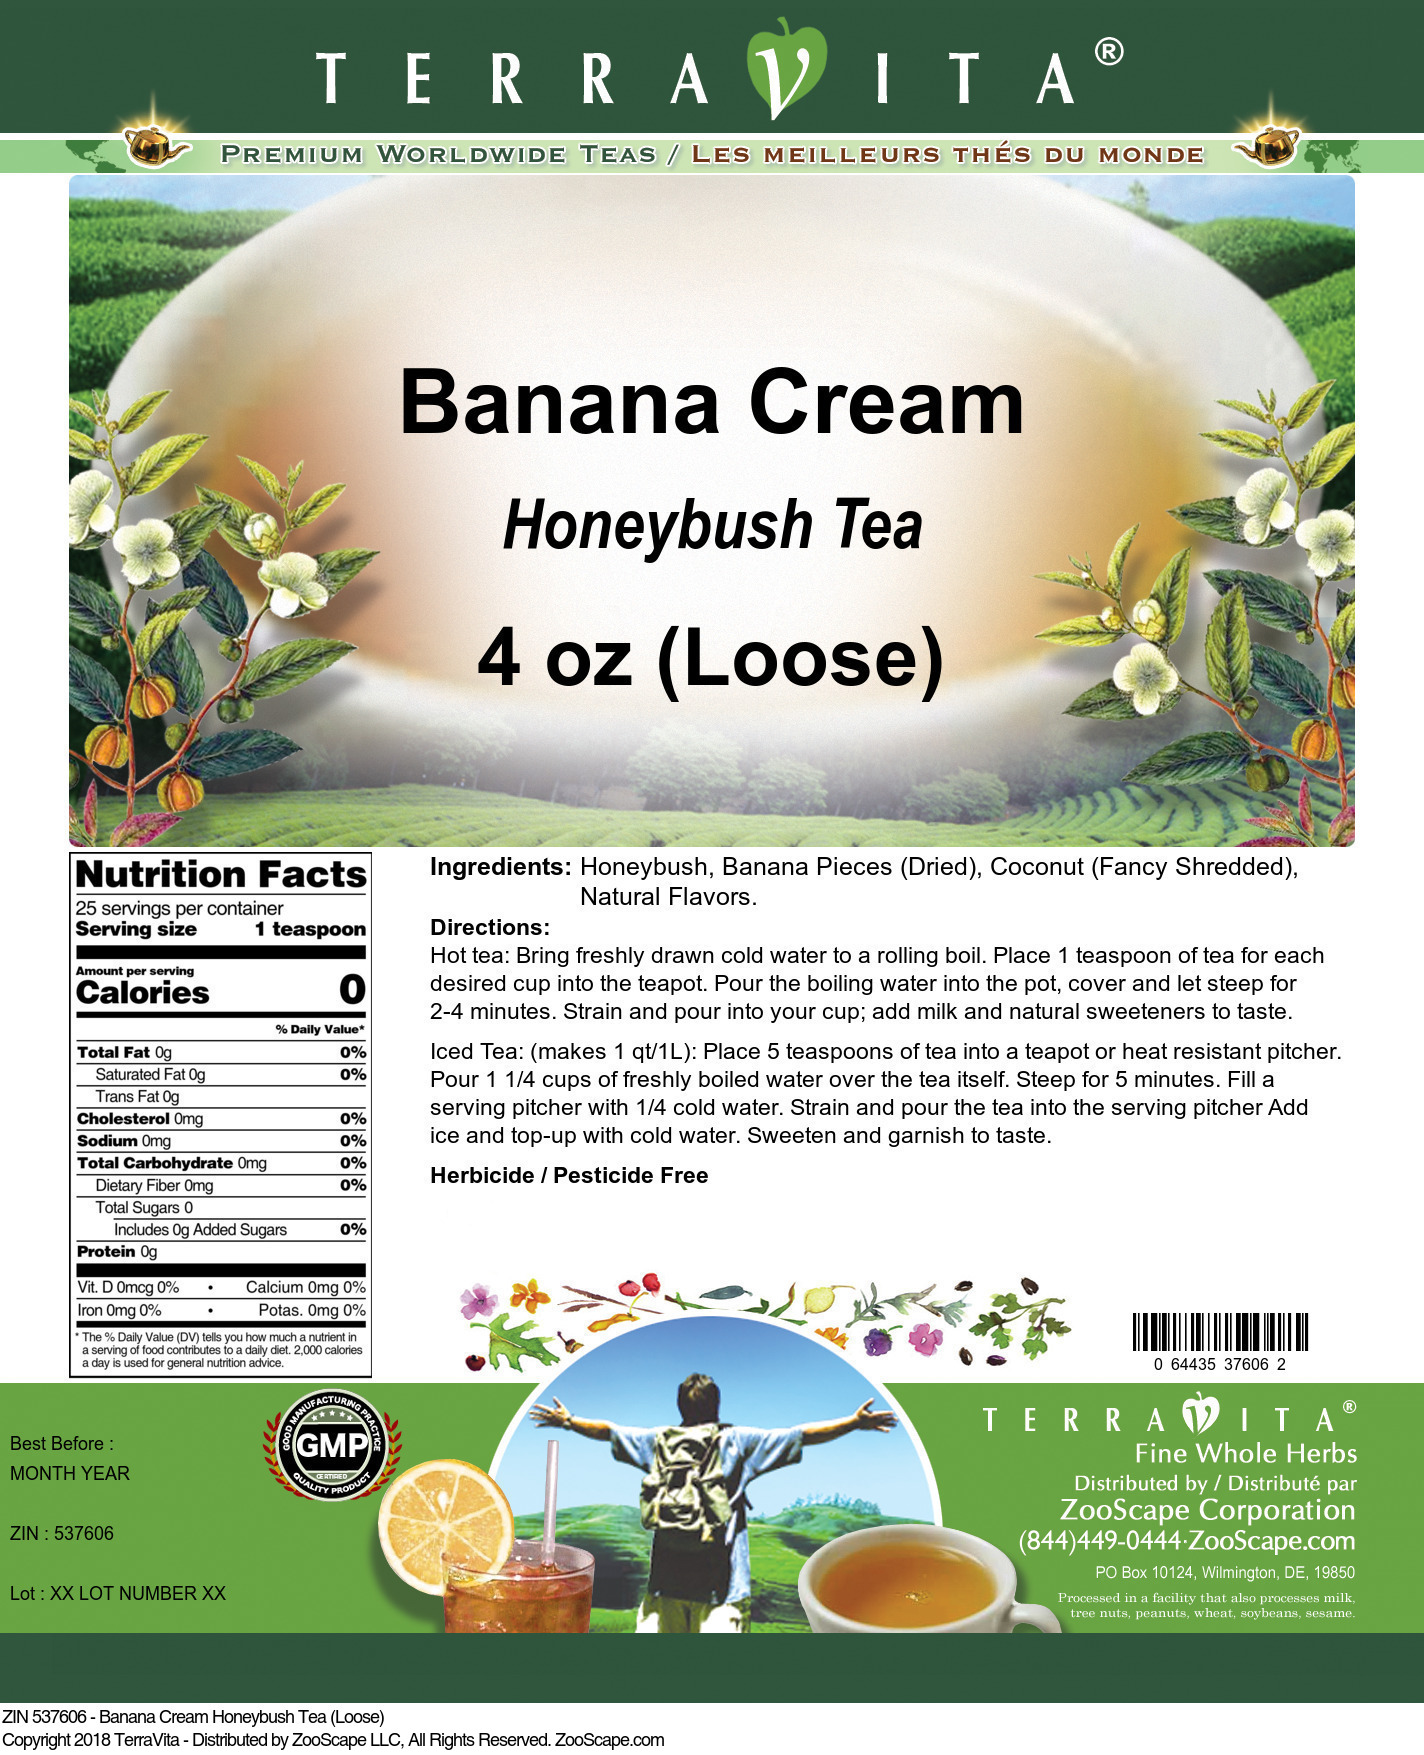 Banana Cream Honeybush Tea